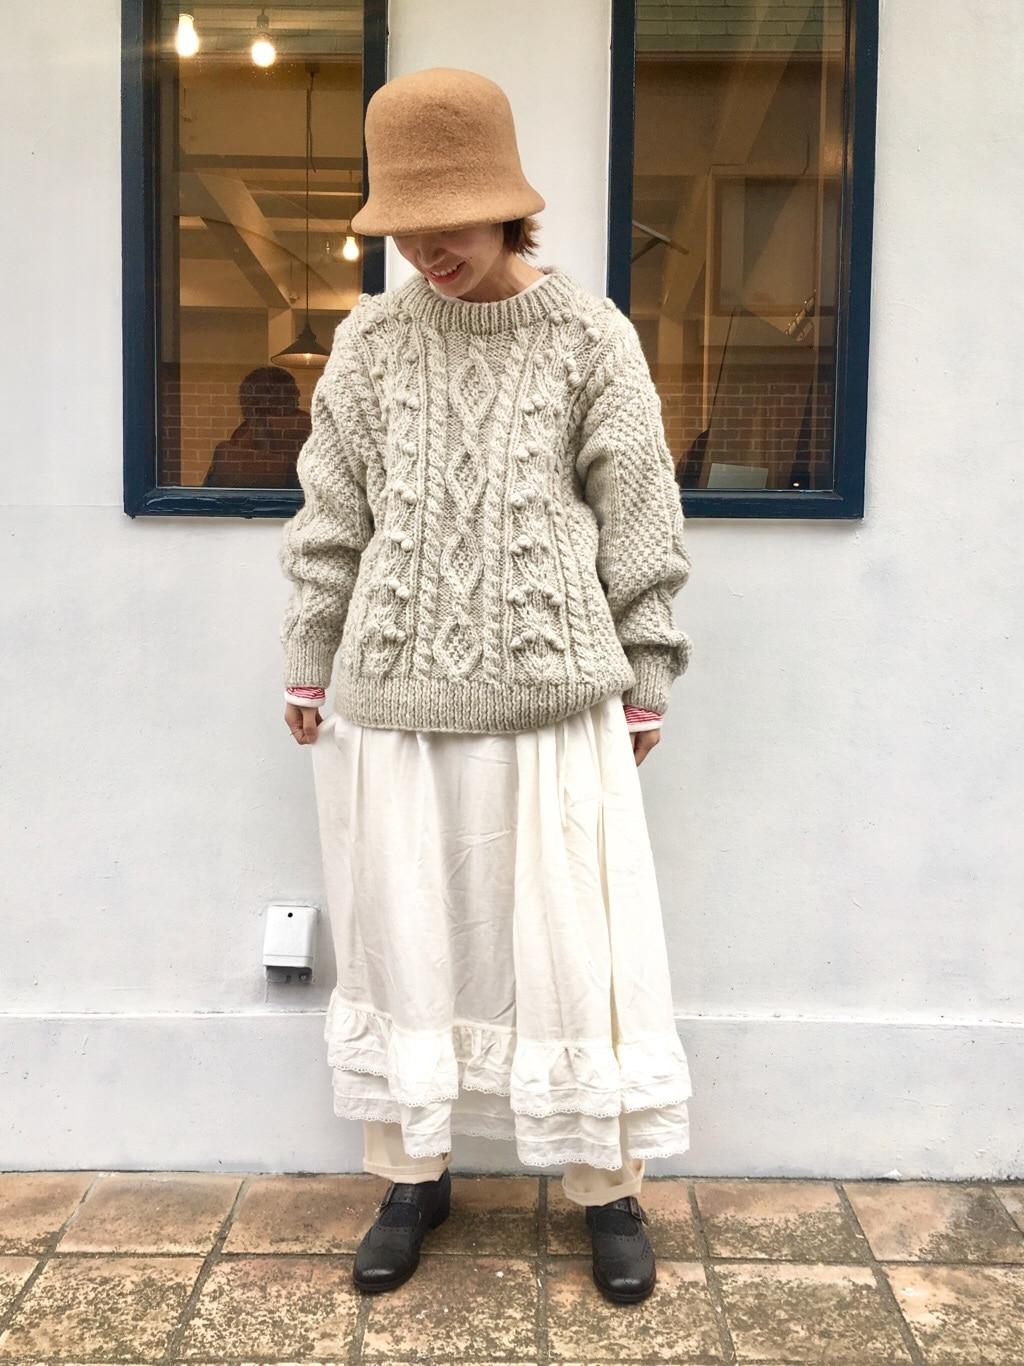 chambre de charme 横浜ジョイナス 身長:160cm 2020.11.11